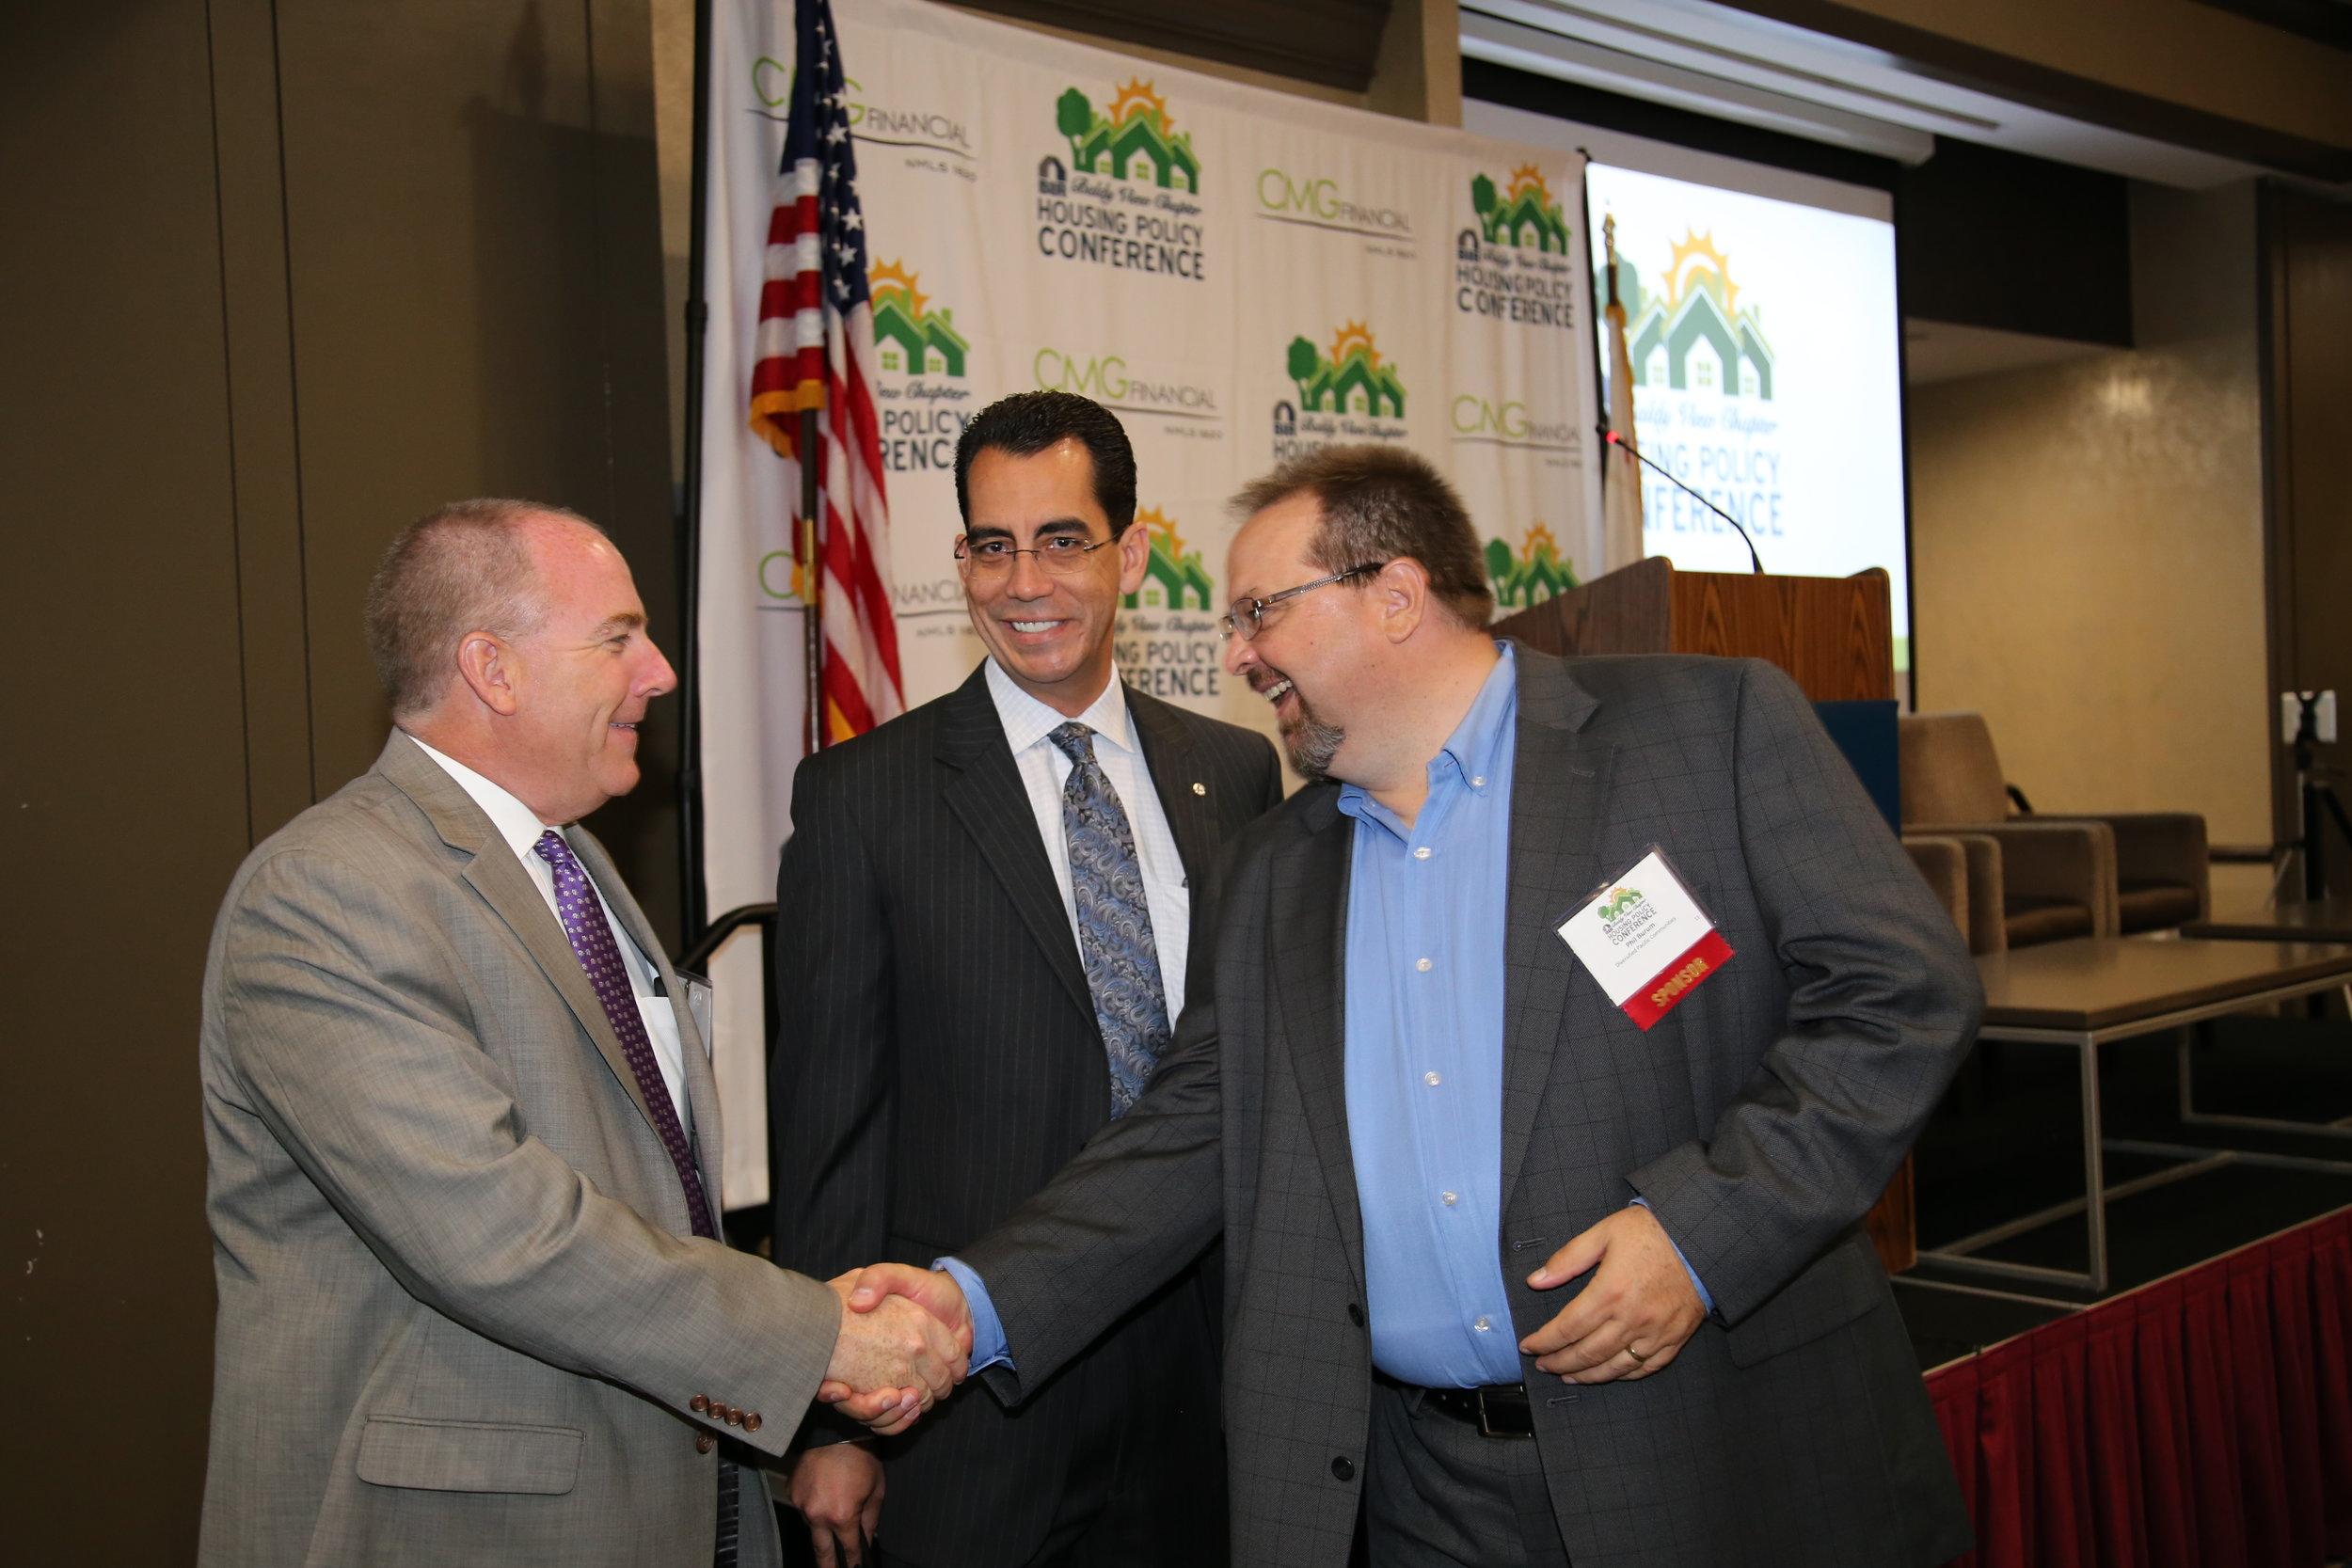 NAHB VP Lake Coulson greets BIABV President Phil Burum along with BIABV CEO Carlos Rodriguez (center)